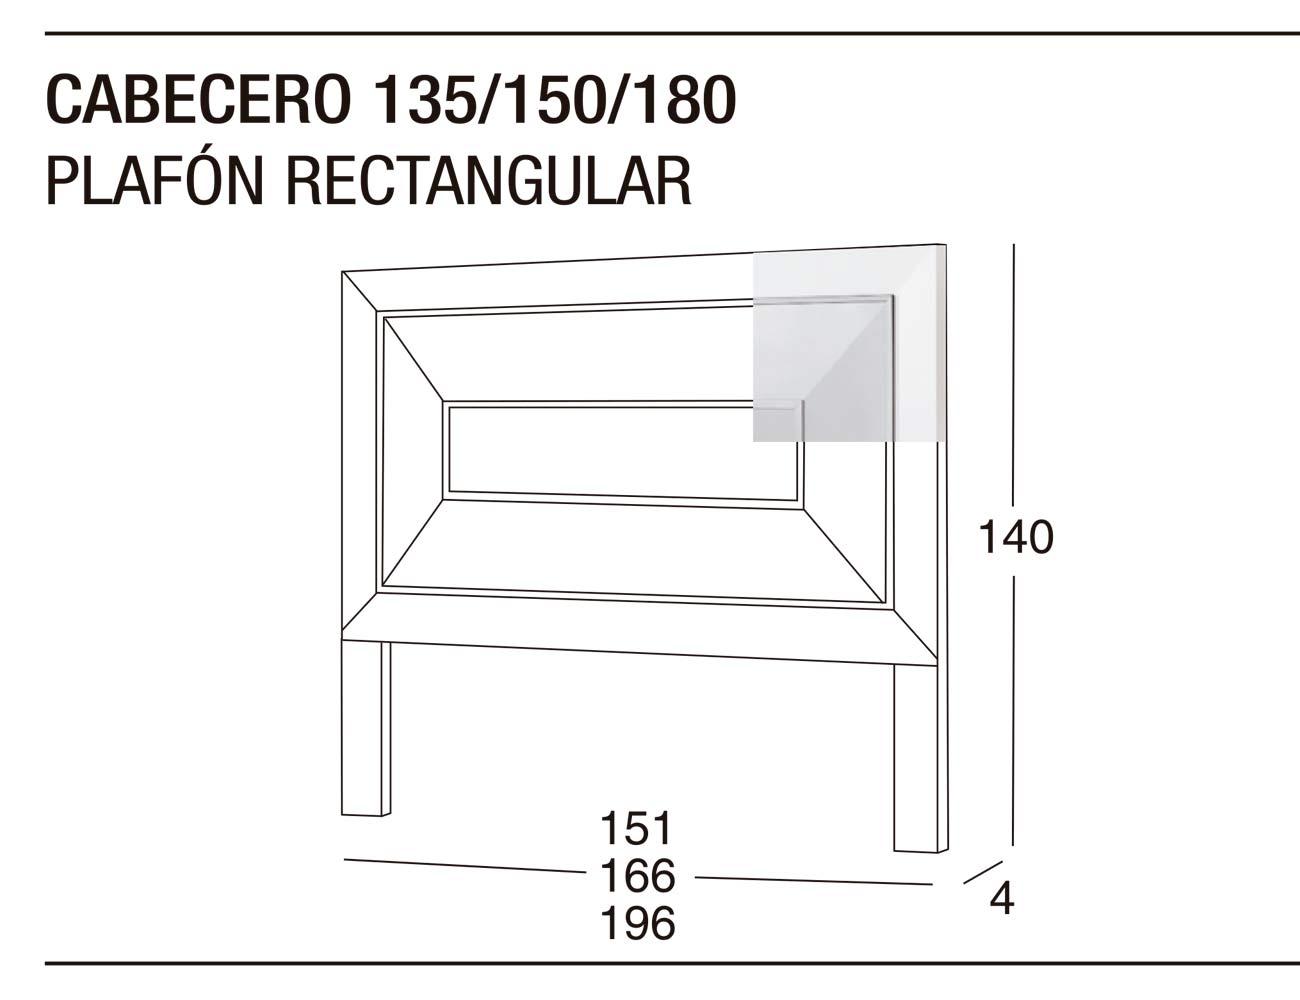 Cabecero 135 150 plafon rectangular 166x140x41